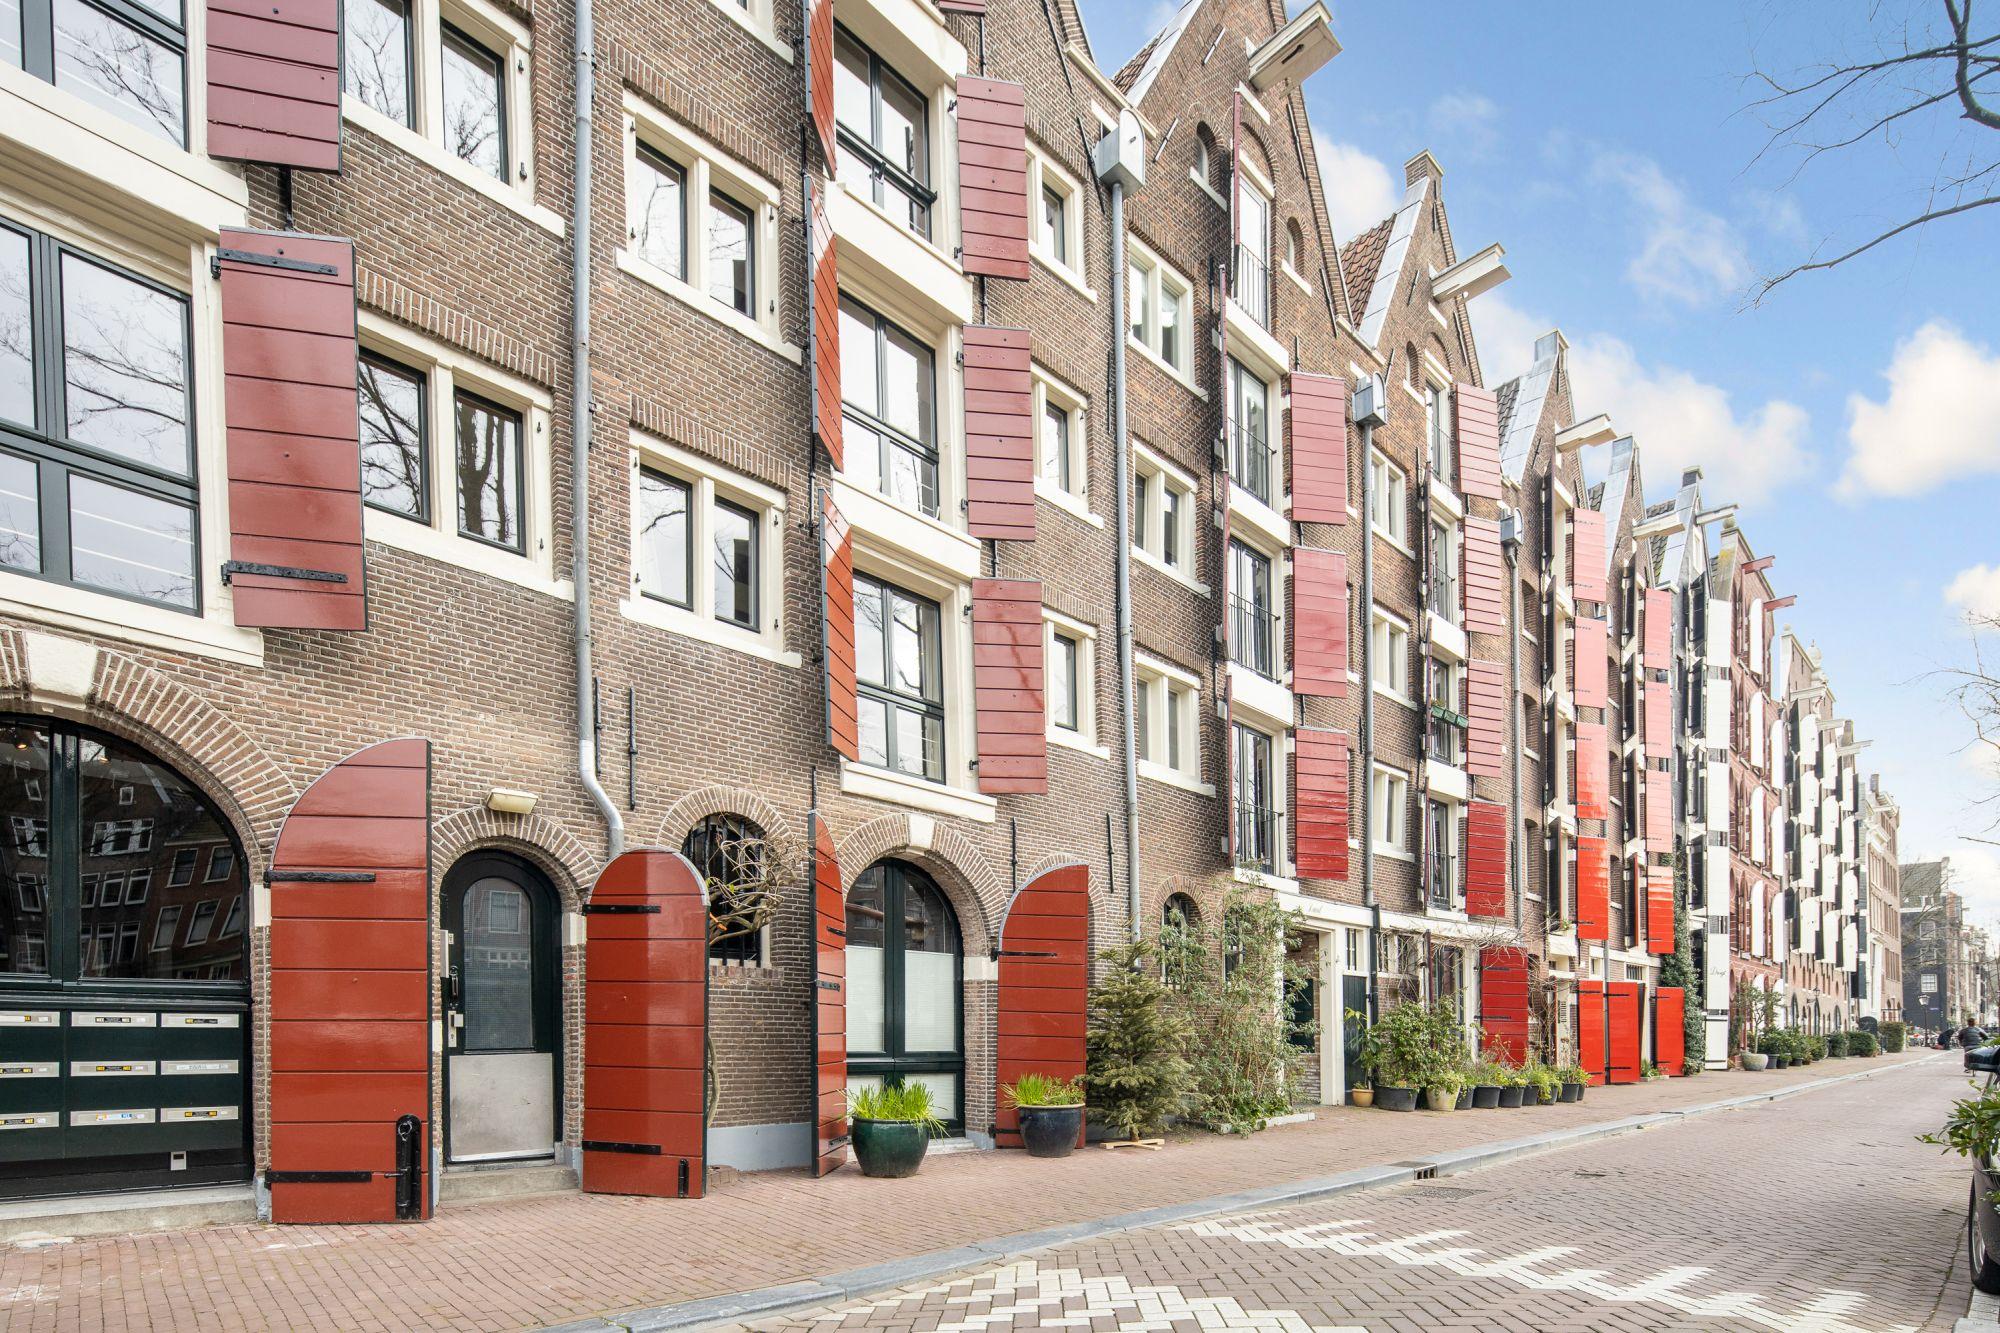 Brouwersgracht, Amsterdam